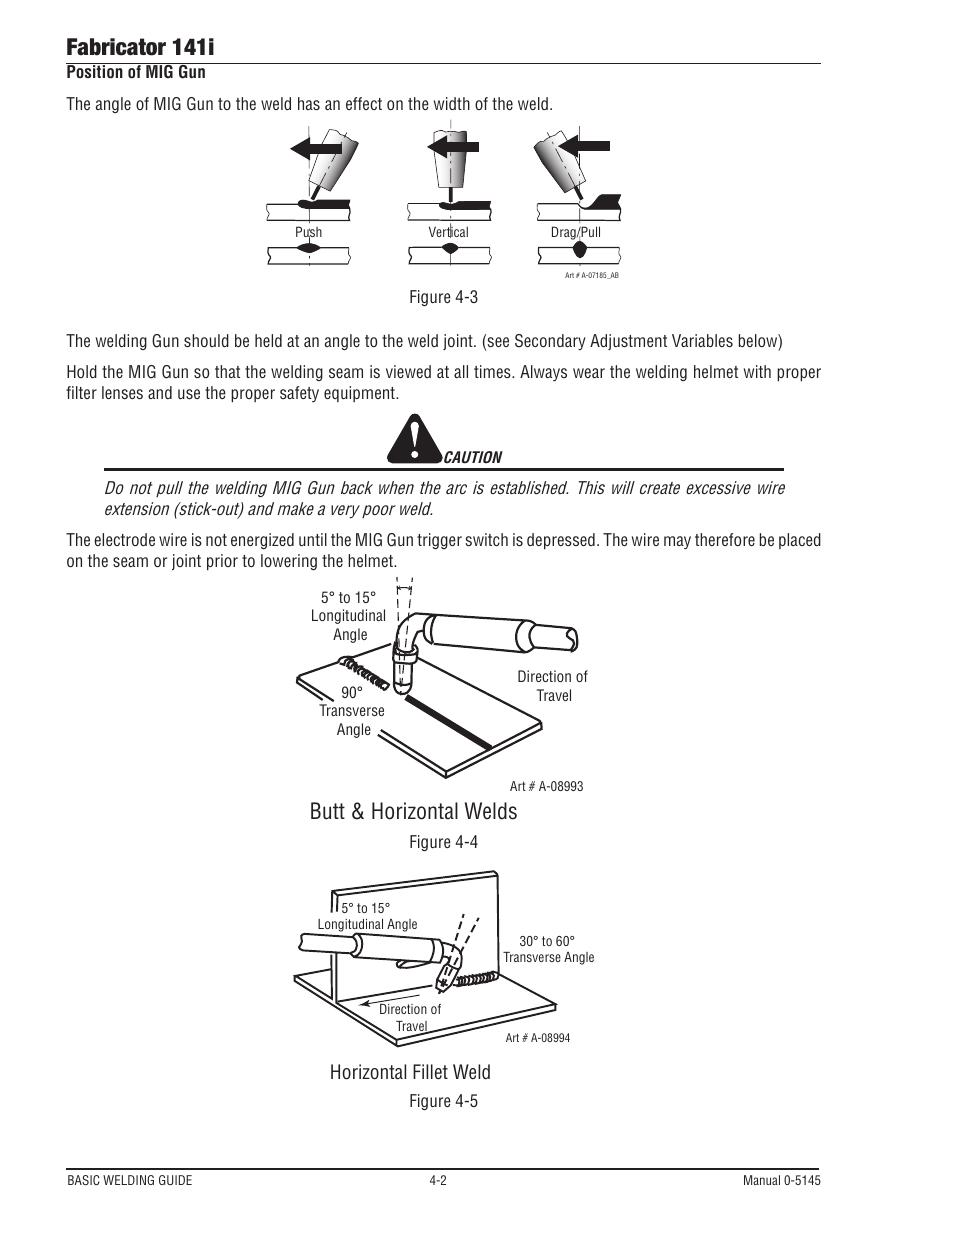 medium resolution of fabricator 141i butt horizontal welds horizontal fillet weld tweco 141i fabricator user manual page 62 104